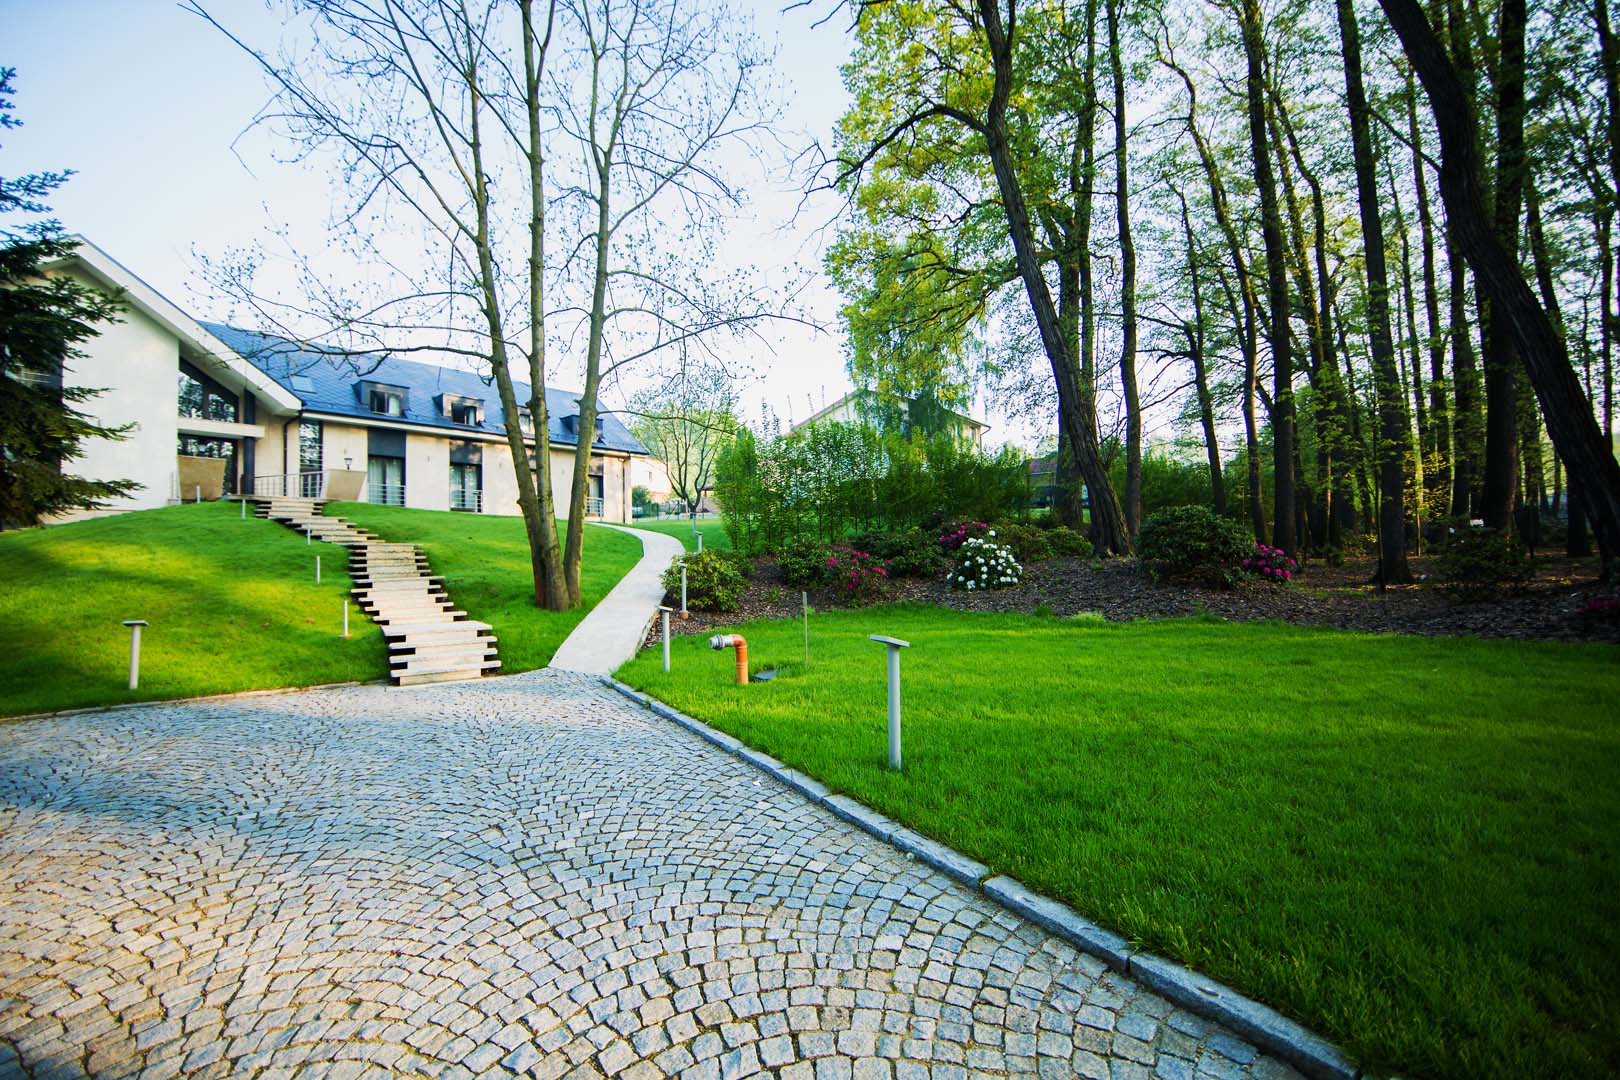 Záhrada a okolie Villa Lariš Petrovice